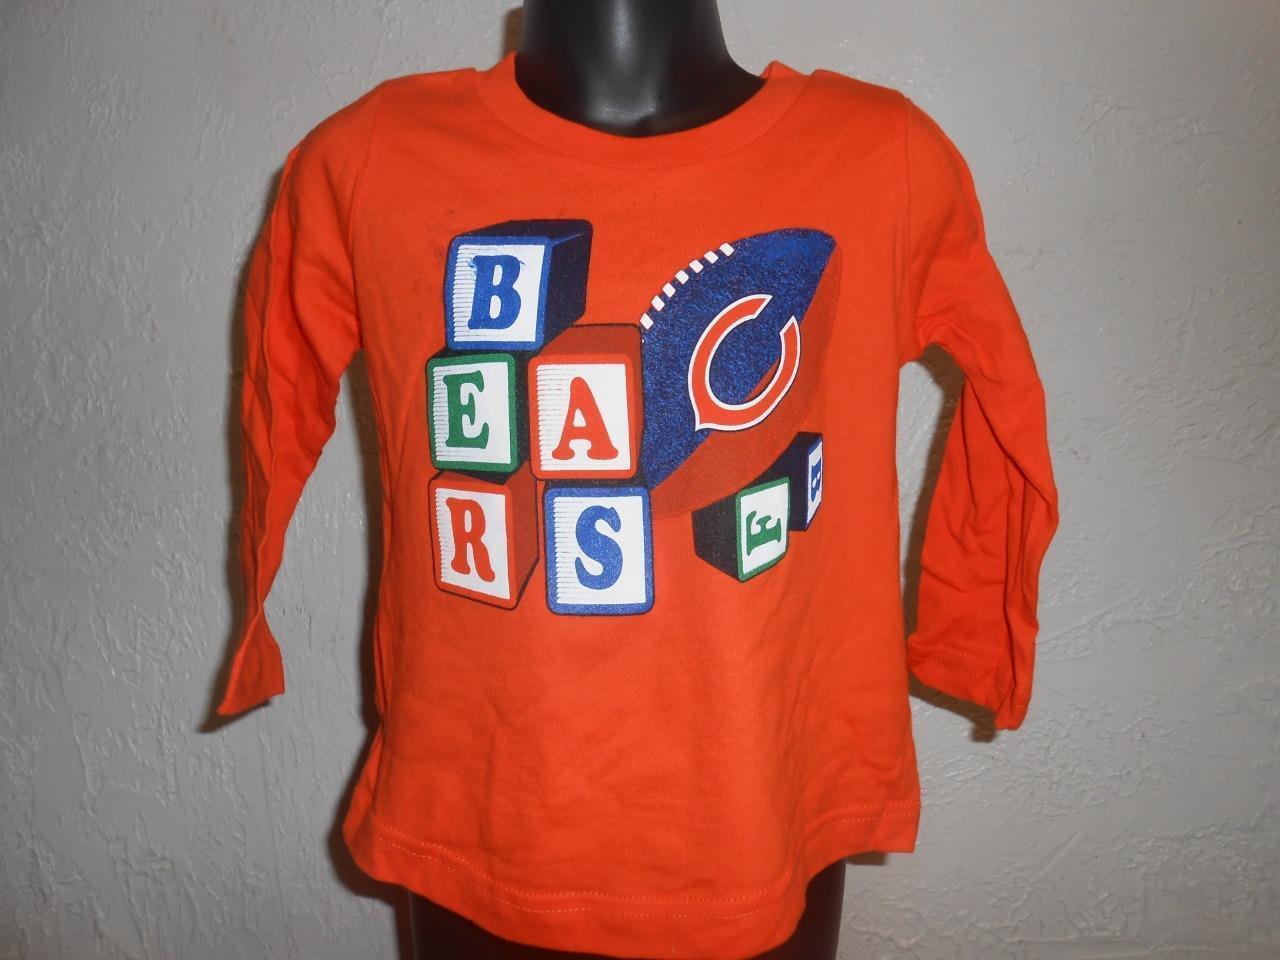 New-Minor Flaw-Chicago Ours Tout-Petit Taille Taille Taille 2T T-Shirt par NFL Équipe Apparel fc8b75